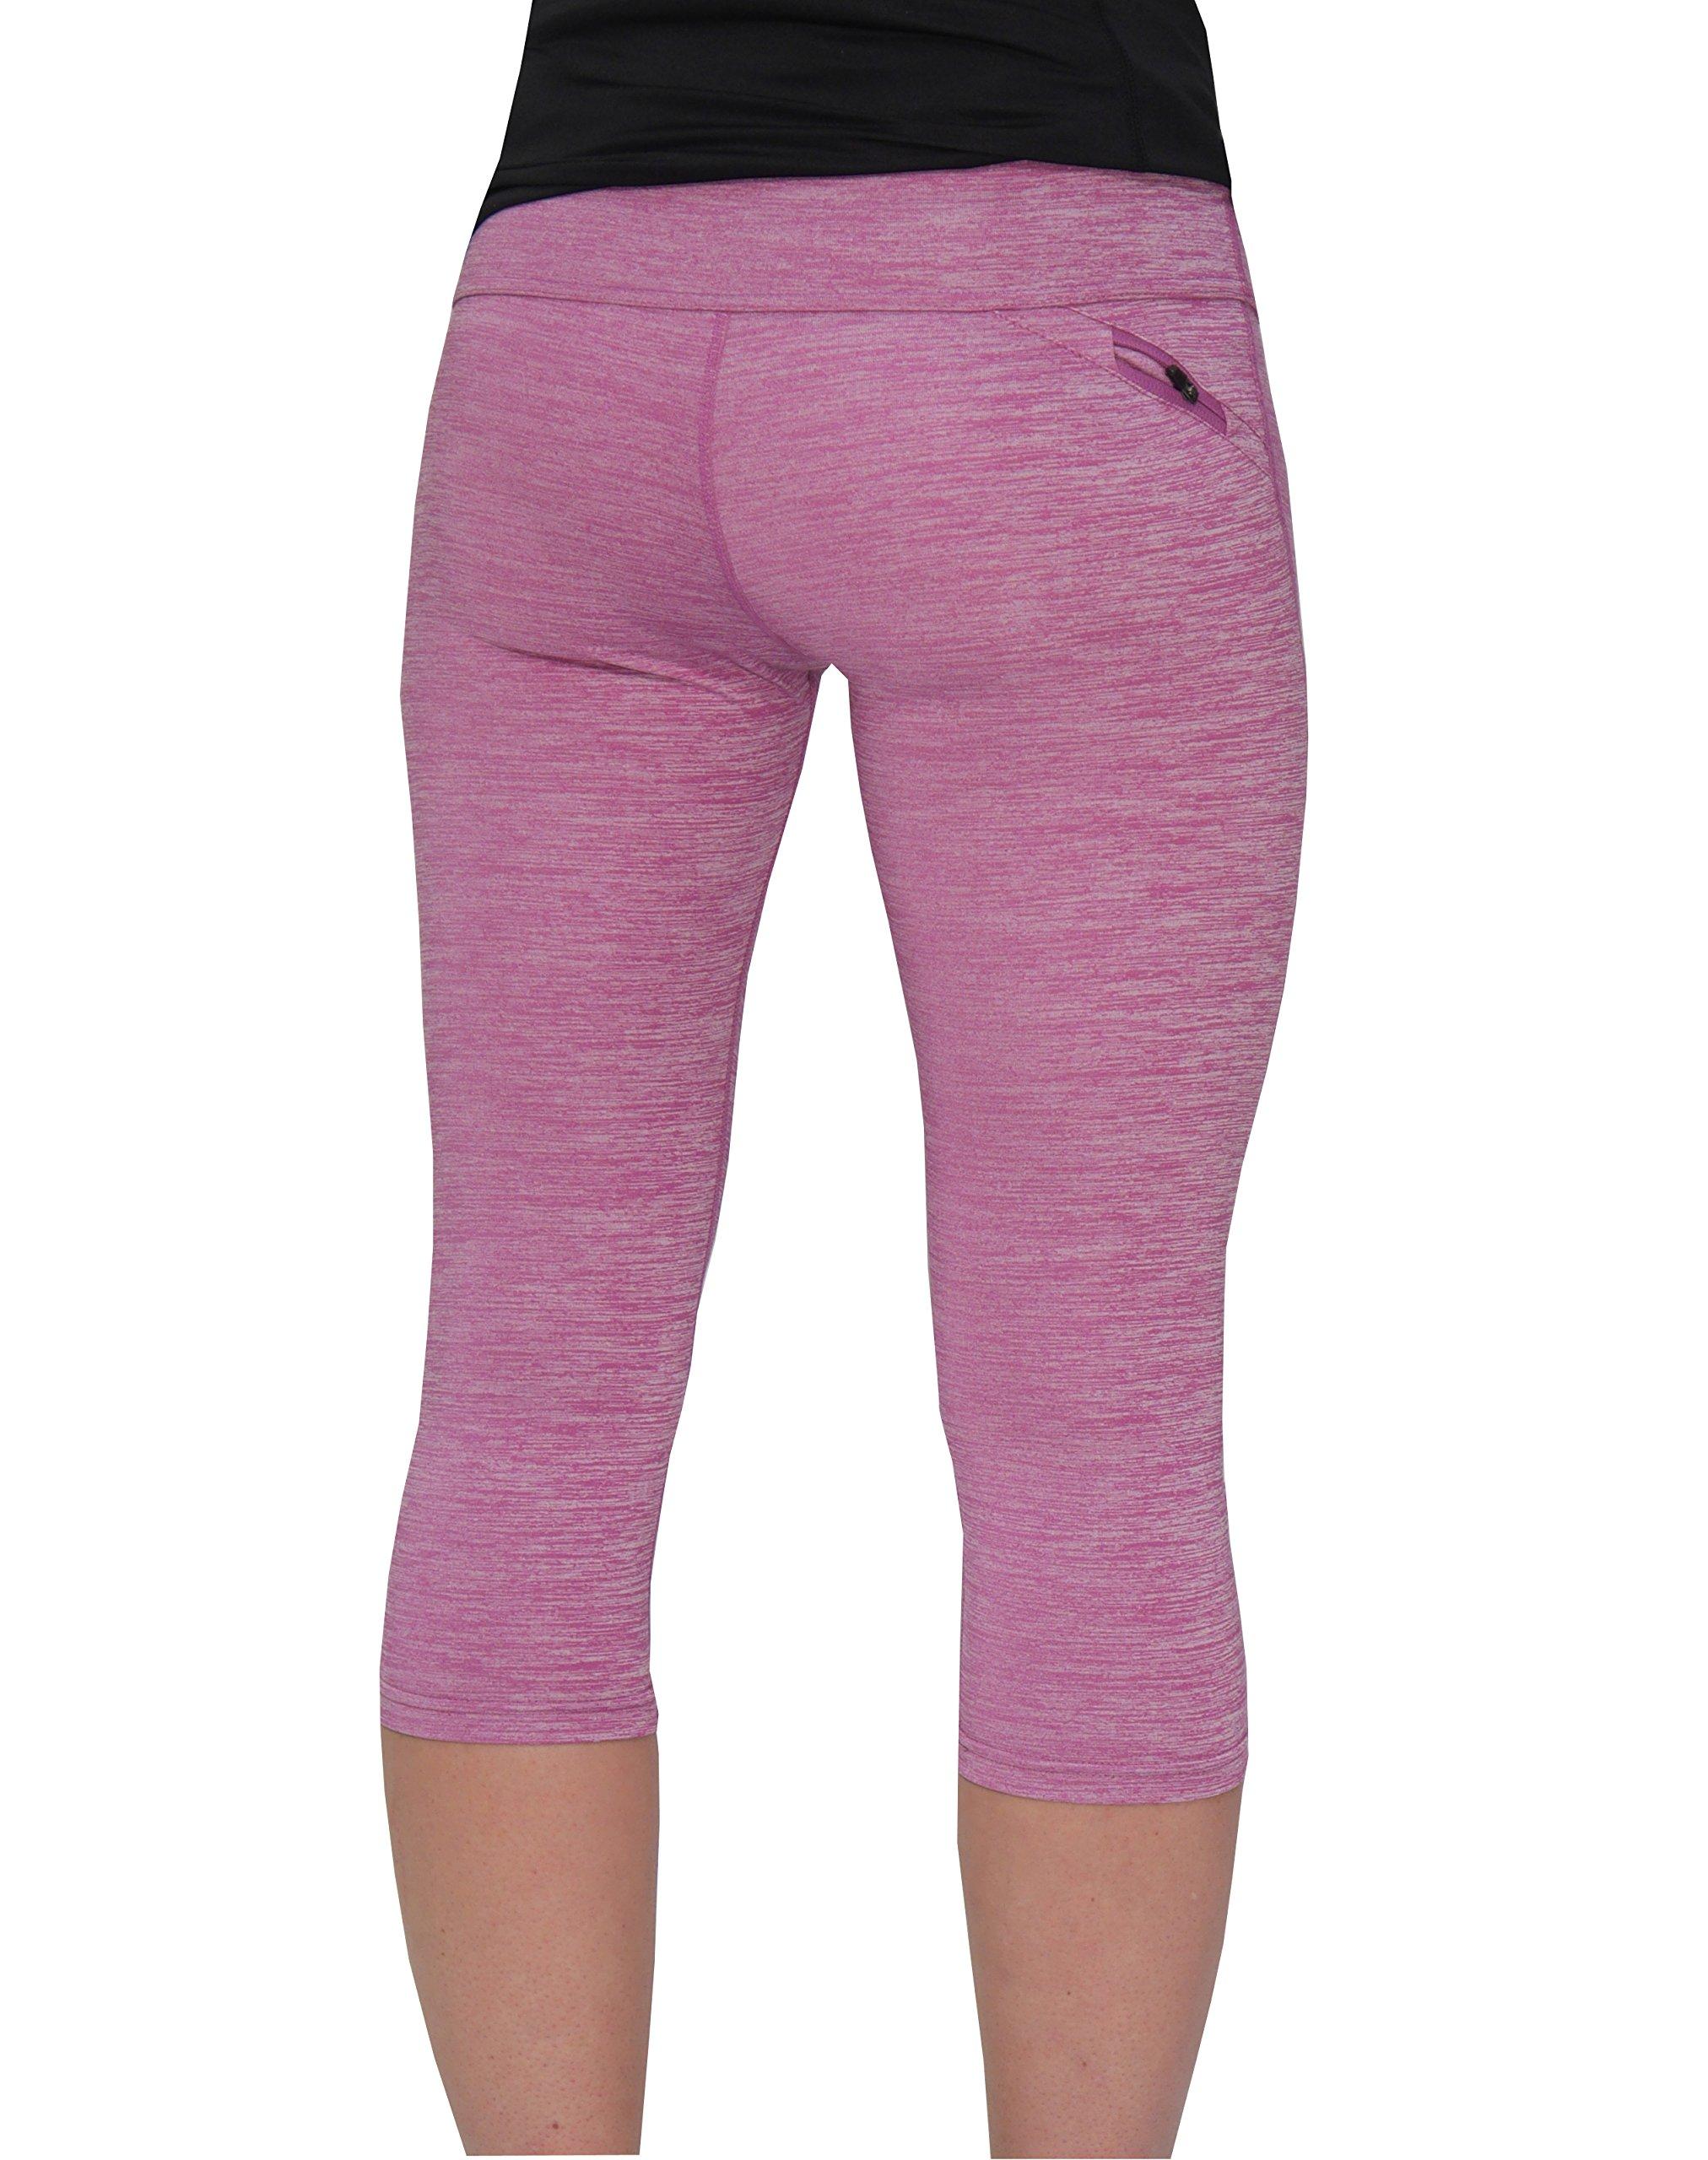 More Mile Heather Womens Capri Sports Tights 3/4 Leggings Exercise Running Training Yoga